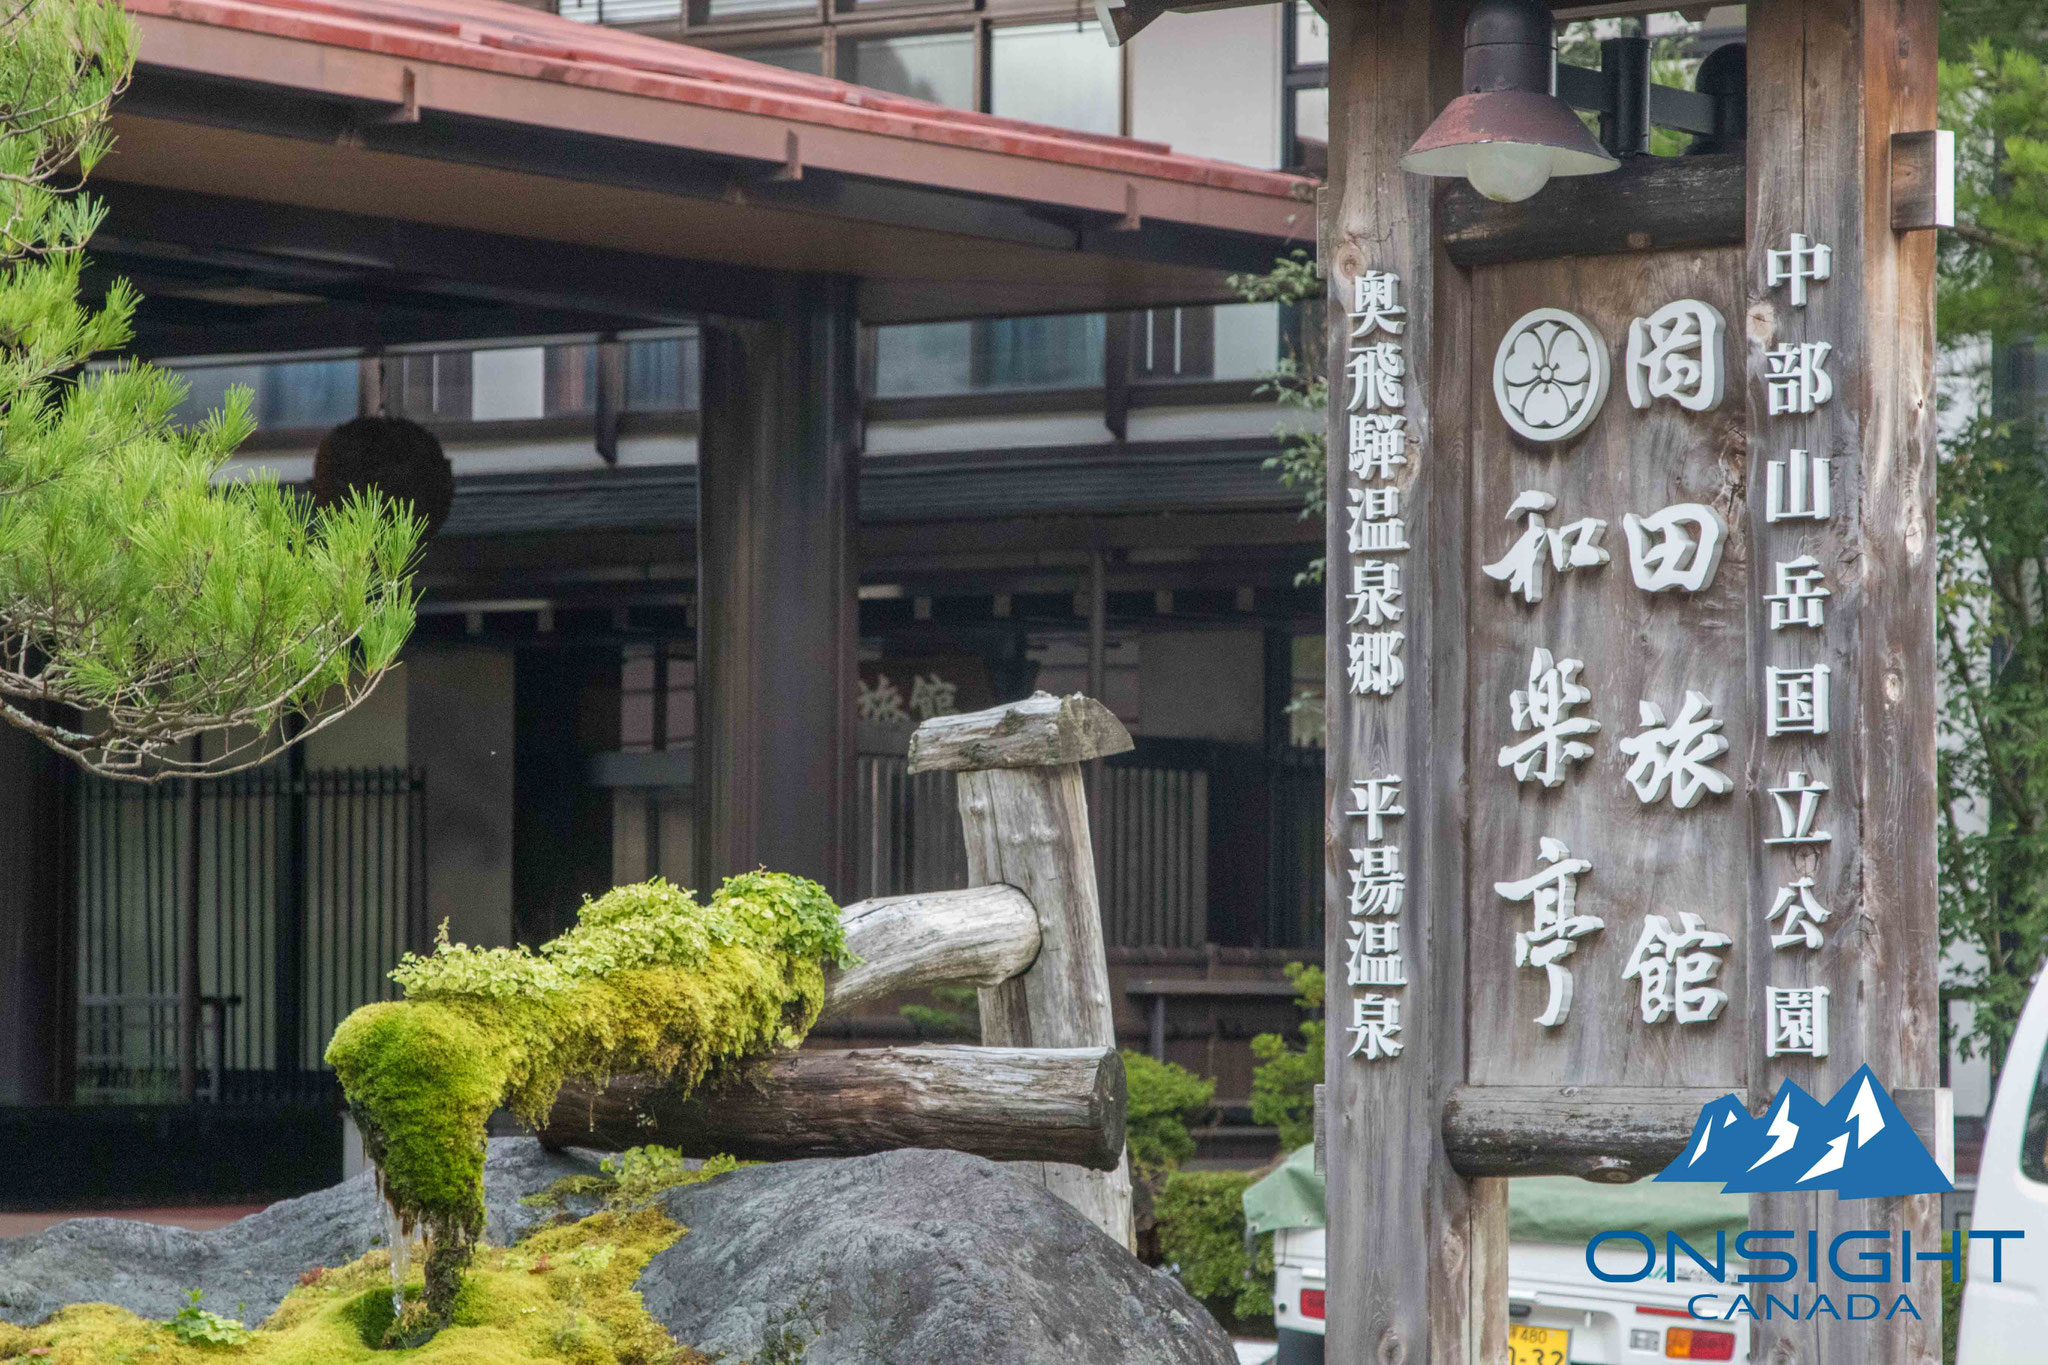 Traverse finish at Onsen ryokan